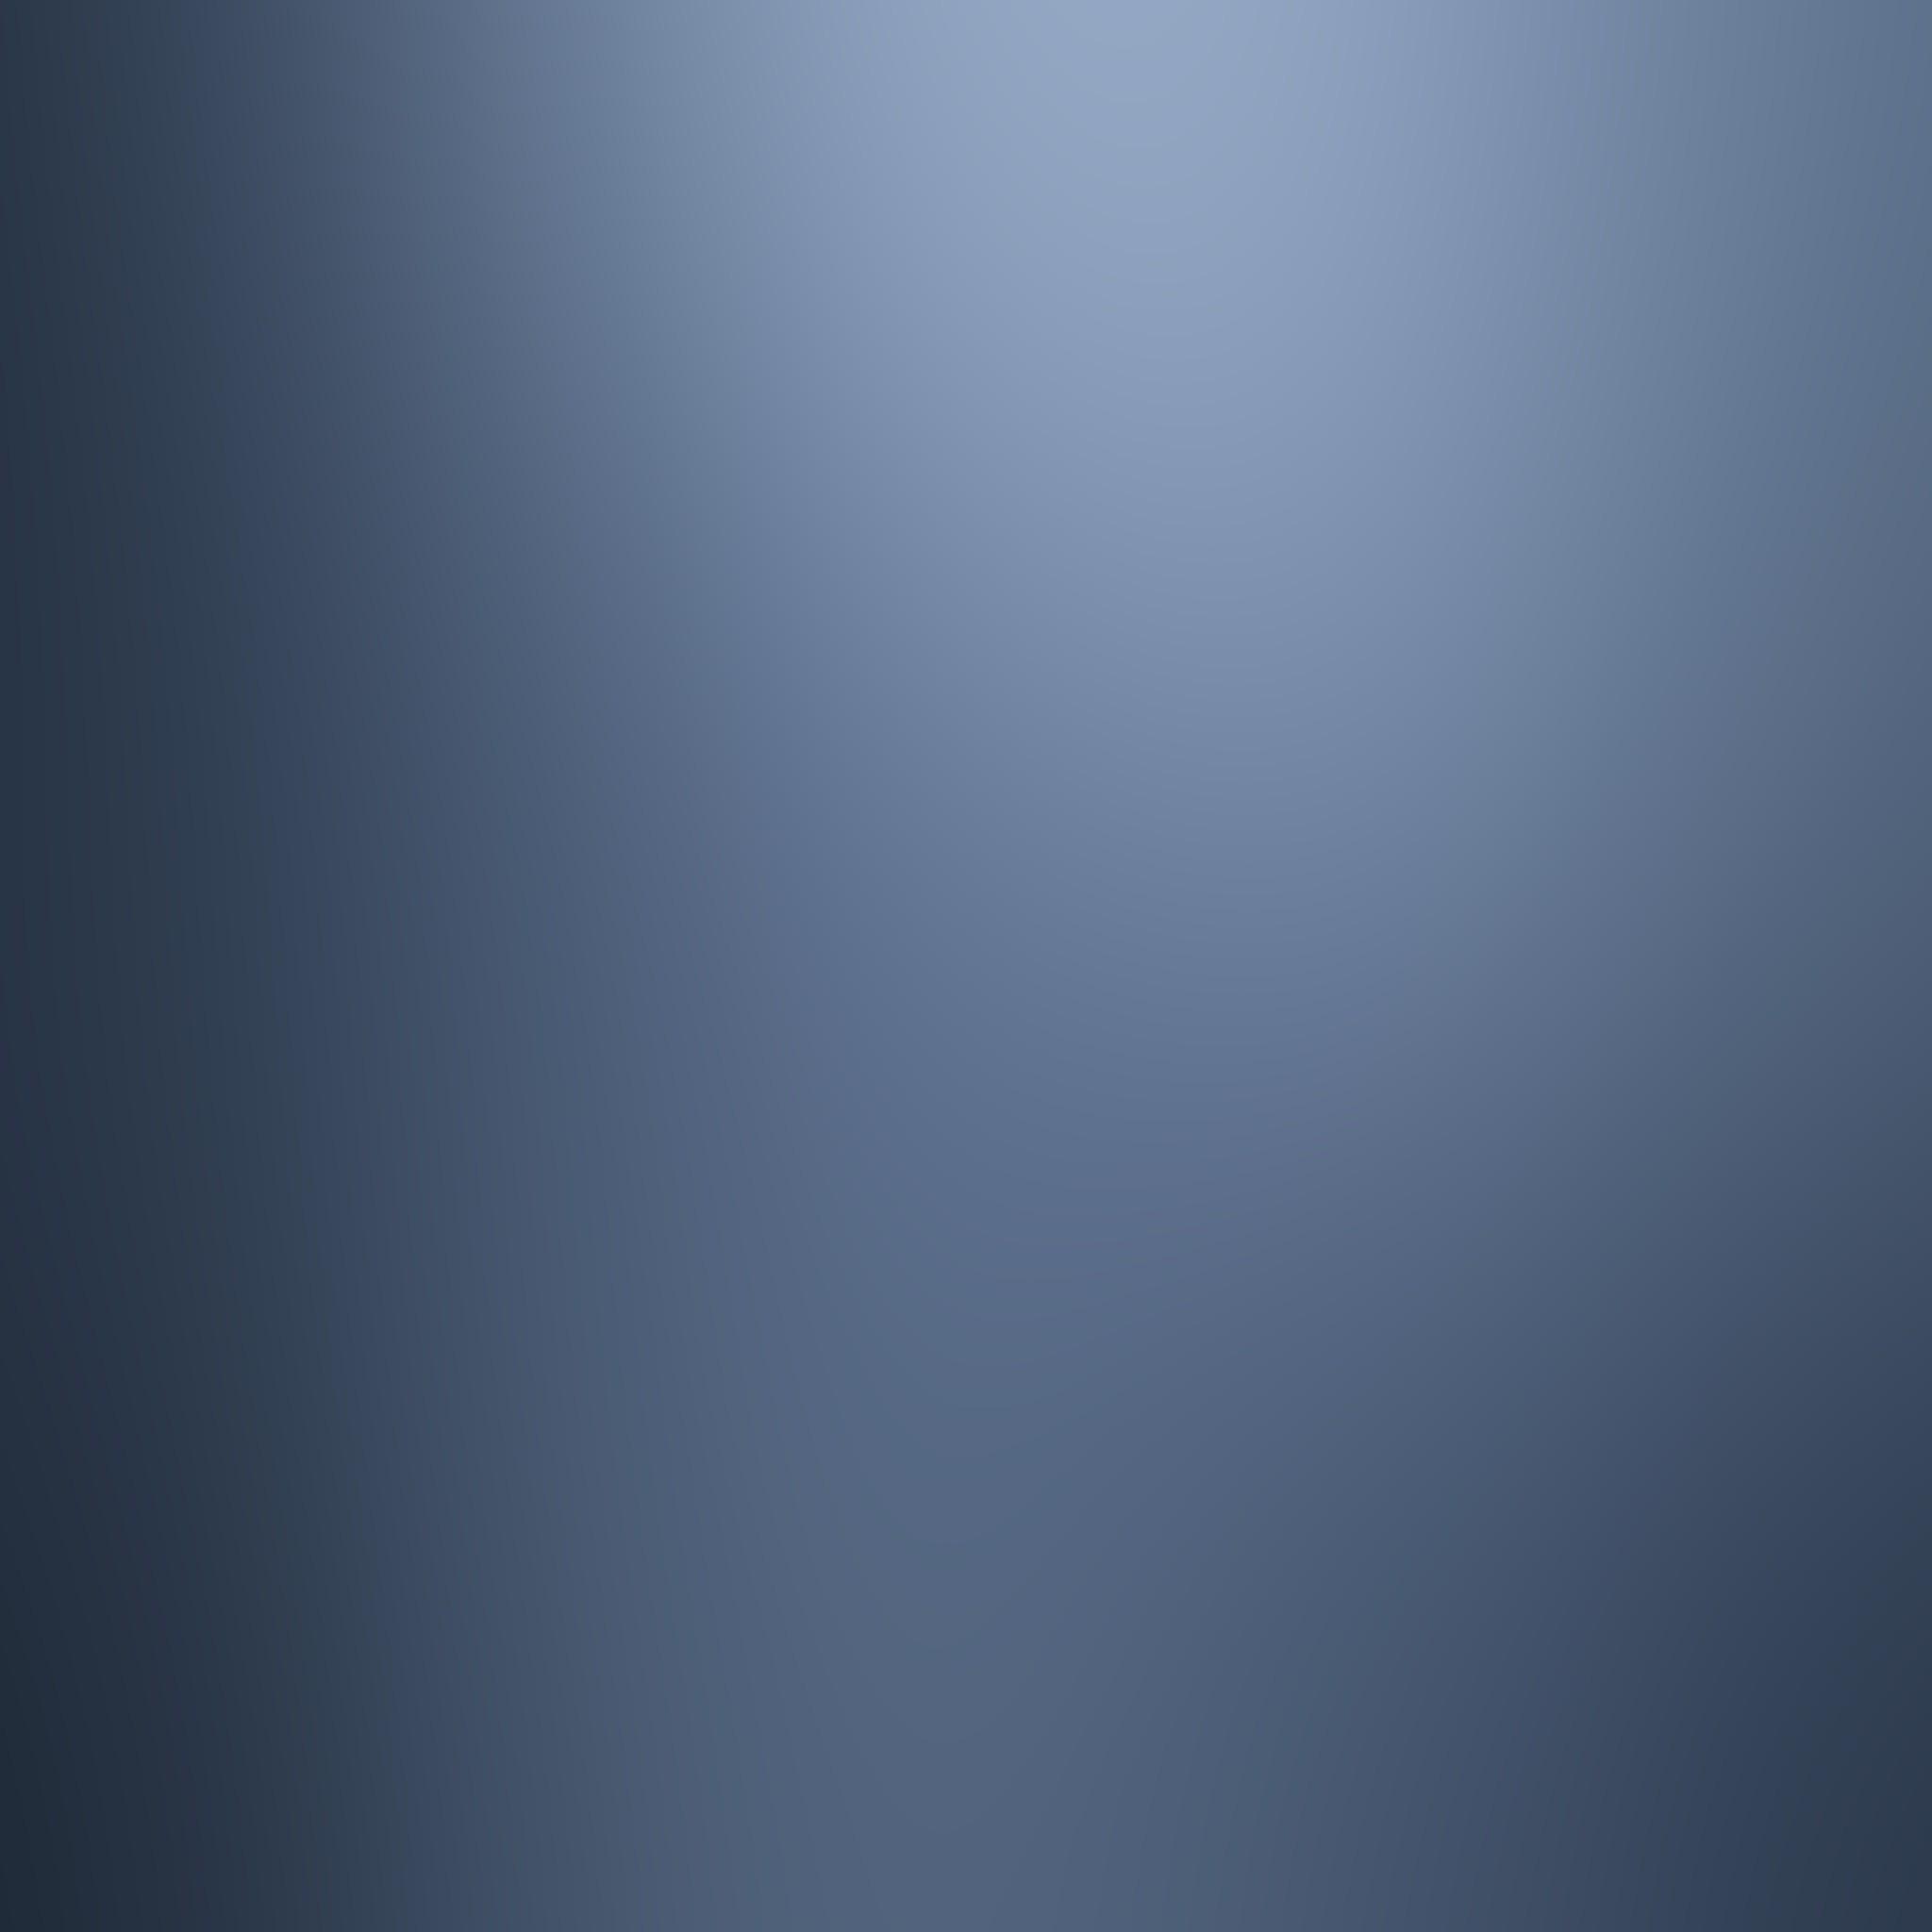 Smooth Navy Gray iOS7 iPad Wallpaper HD